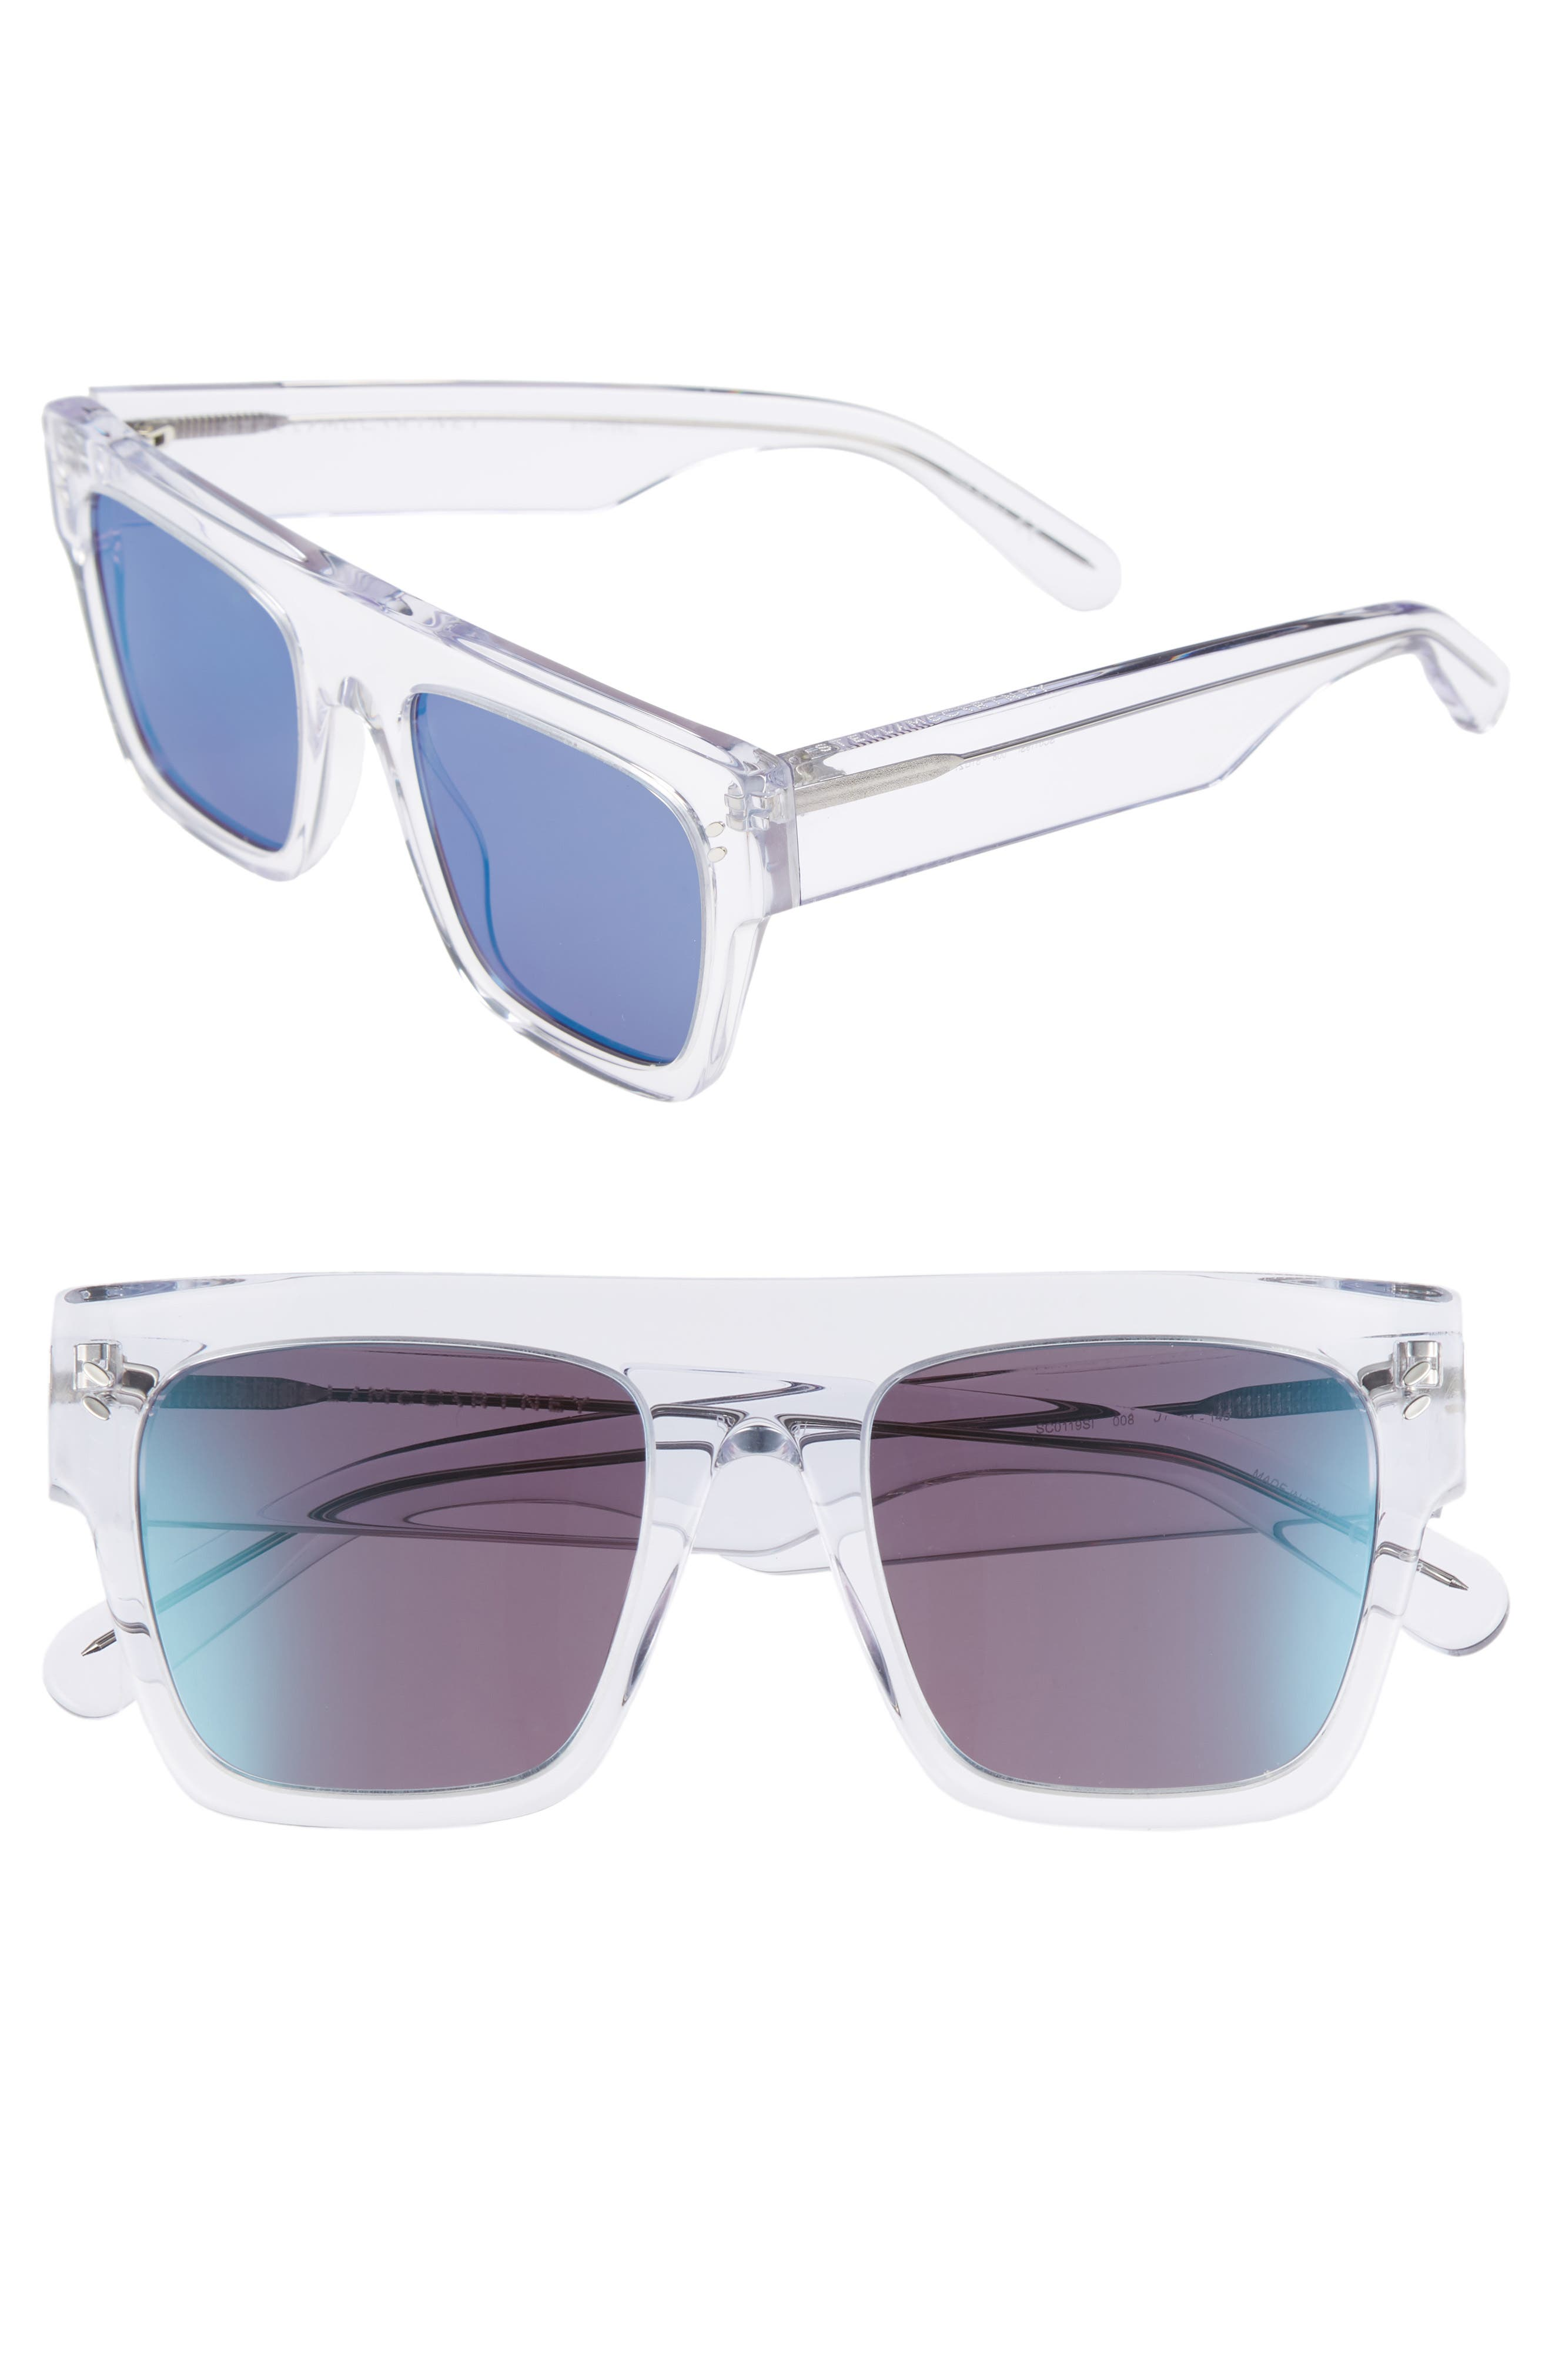 51mm Flattop Sunglasses,                             Main thumbnail 1, color,                             Crystal